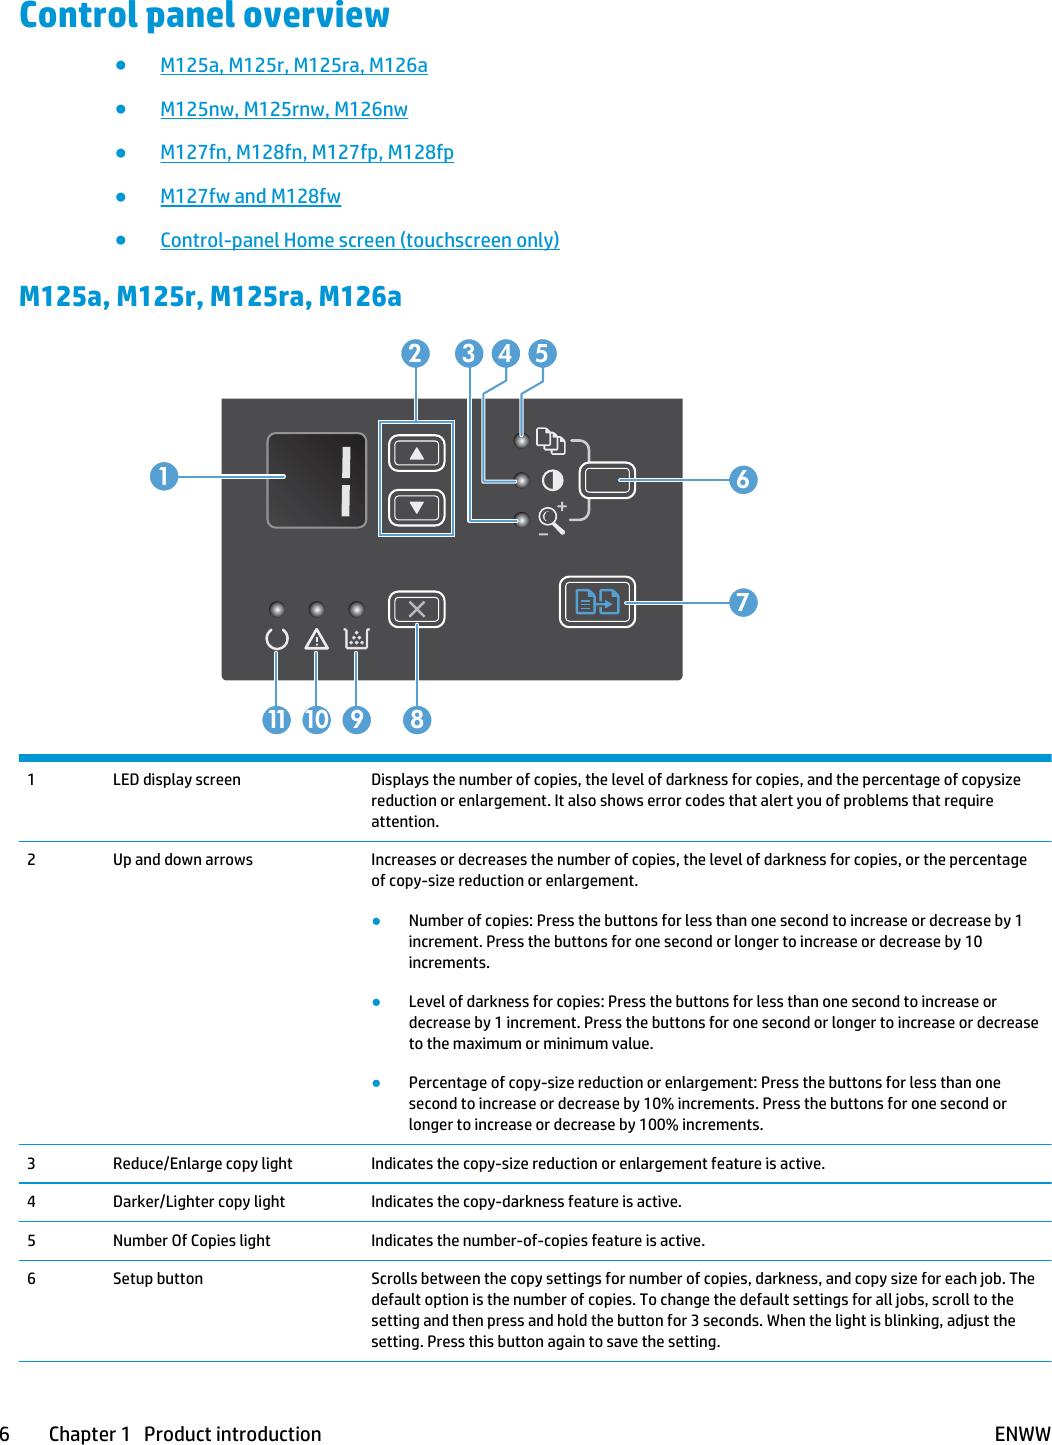 Hp Laserjet Pro Mfp M127Fn Users Manual M125 126/M127 128 User Guide